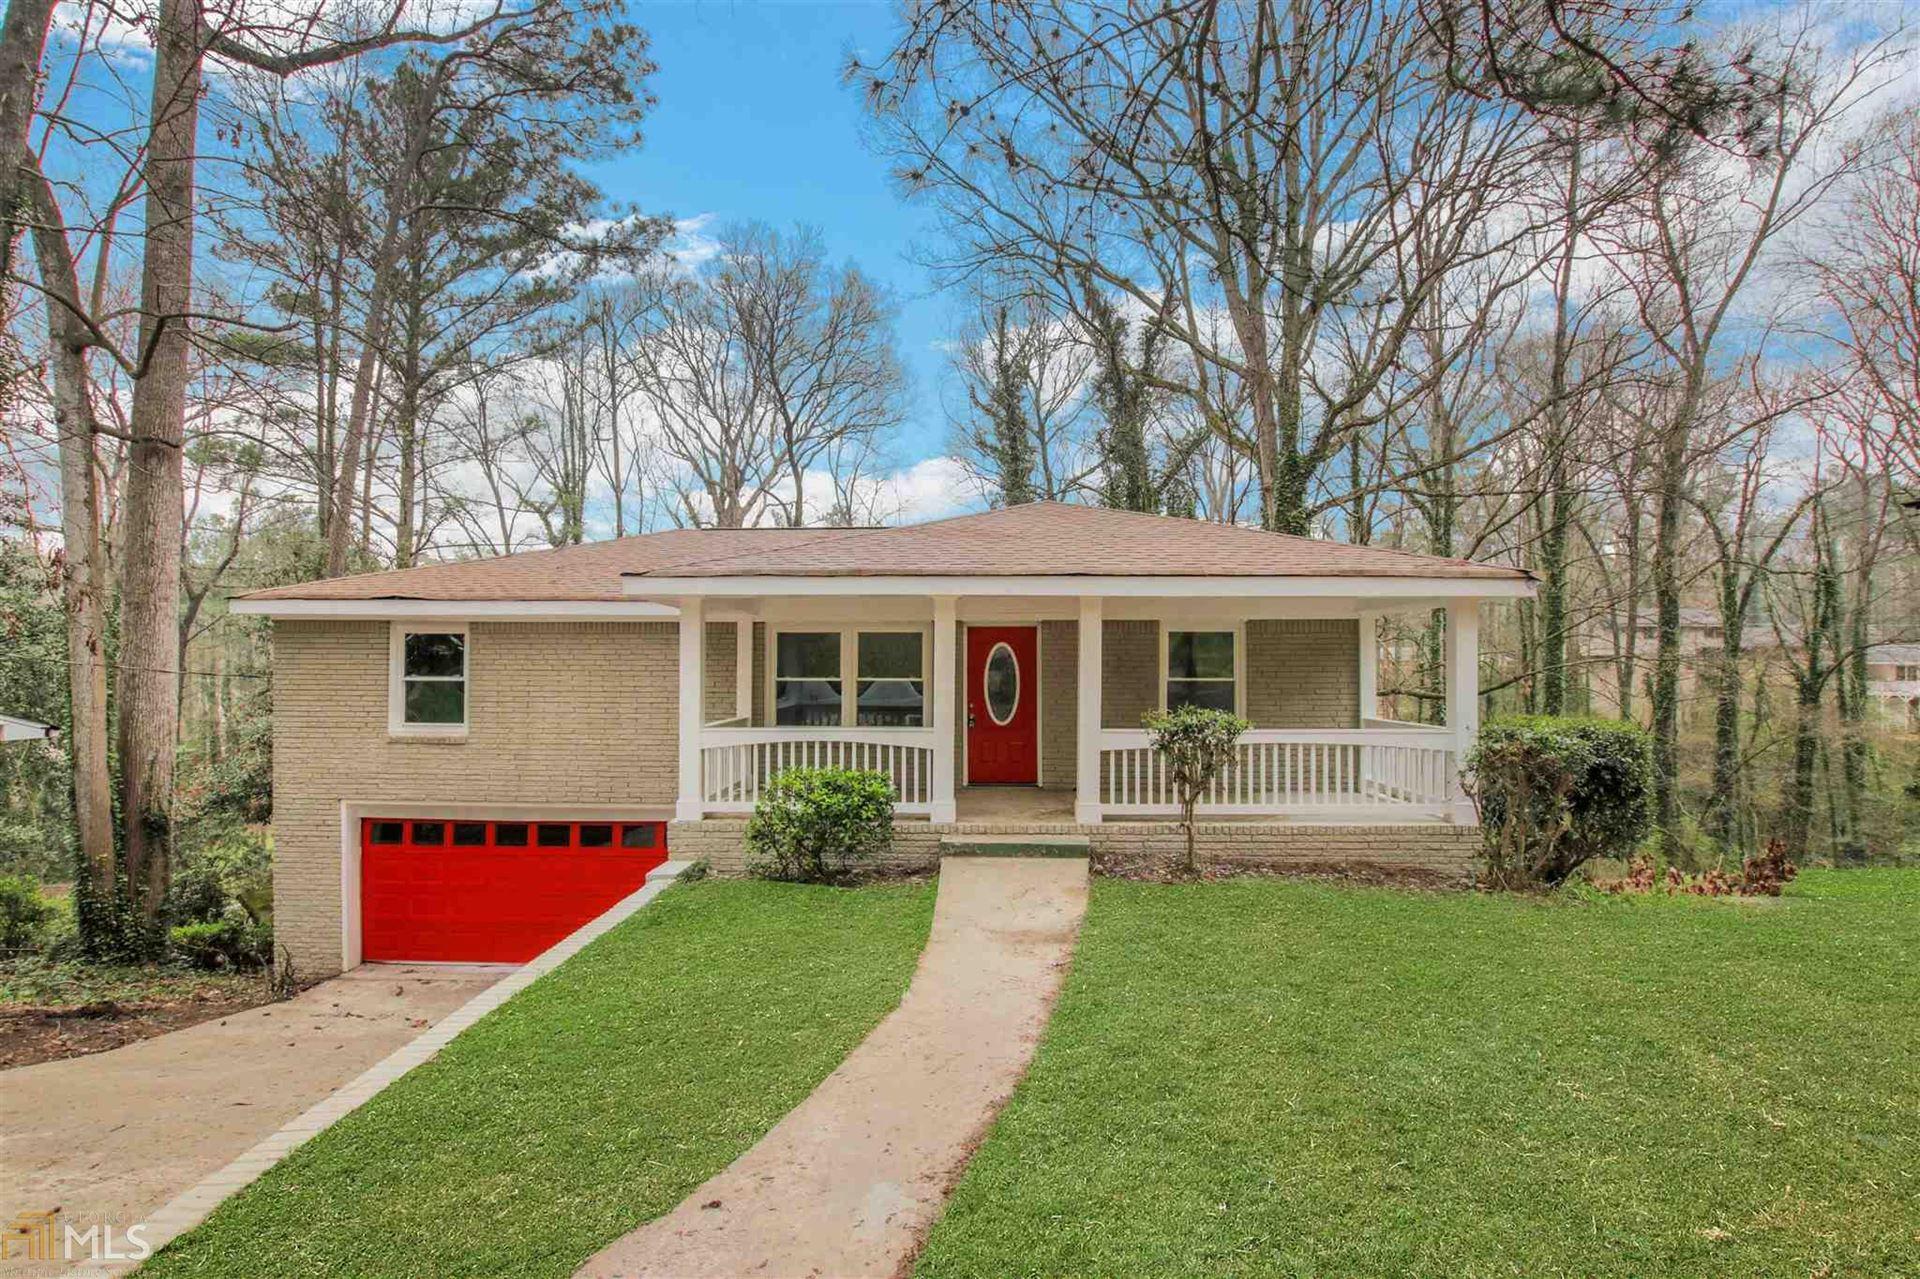 479 Larchmont Cir, Atlanta, GA 30318 - #: 8955638